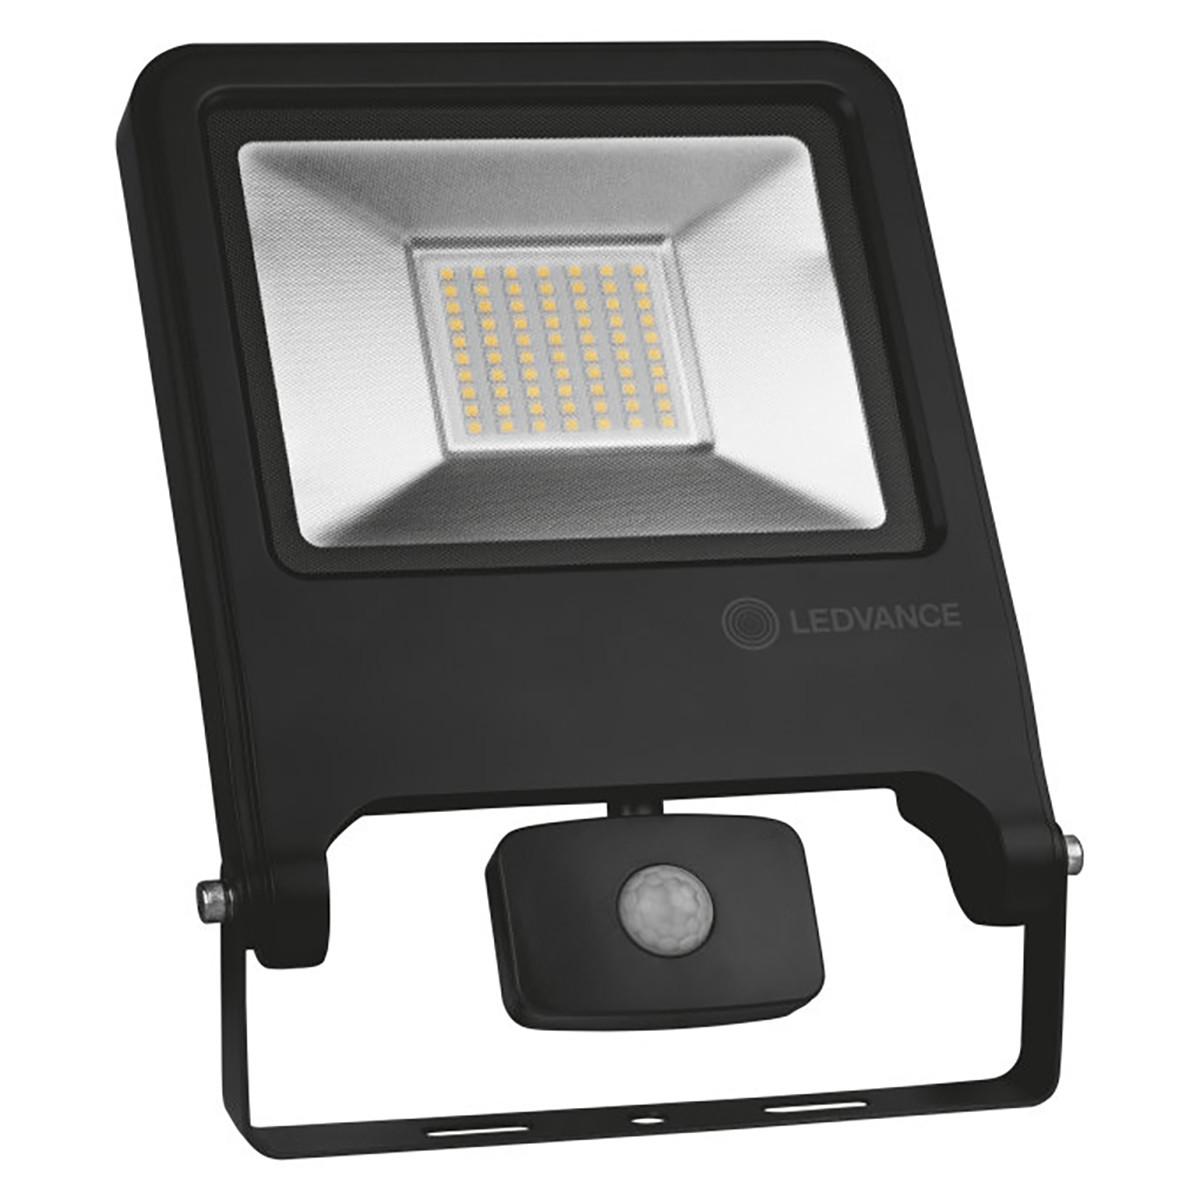 OSRAM - LEDVANCE - LED Breedstraler 50 Watt met sensor - LED Schijnwerper - Natuurlijk Wit 4000K - S